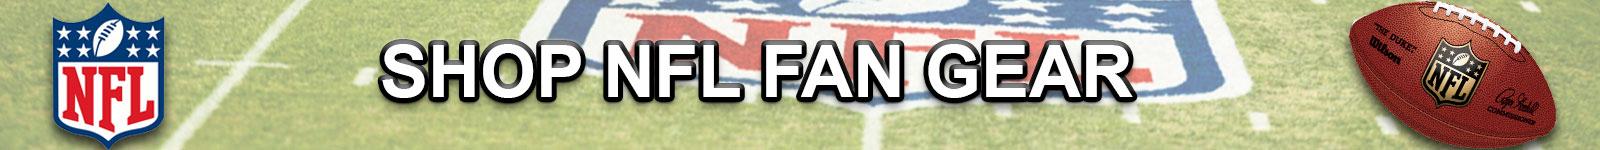 Shop NFL Apparel and Team Fan Gear